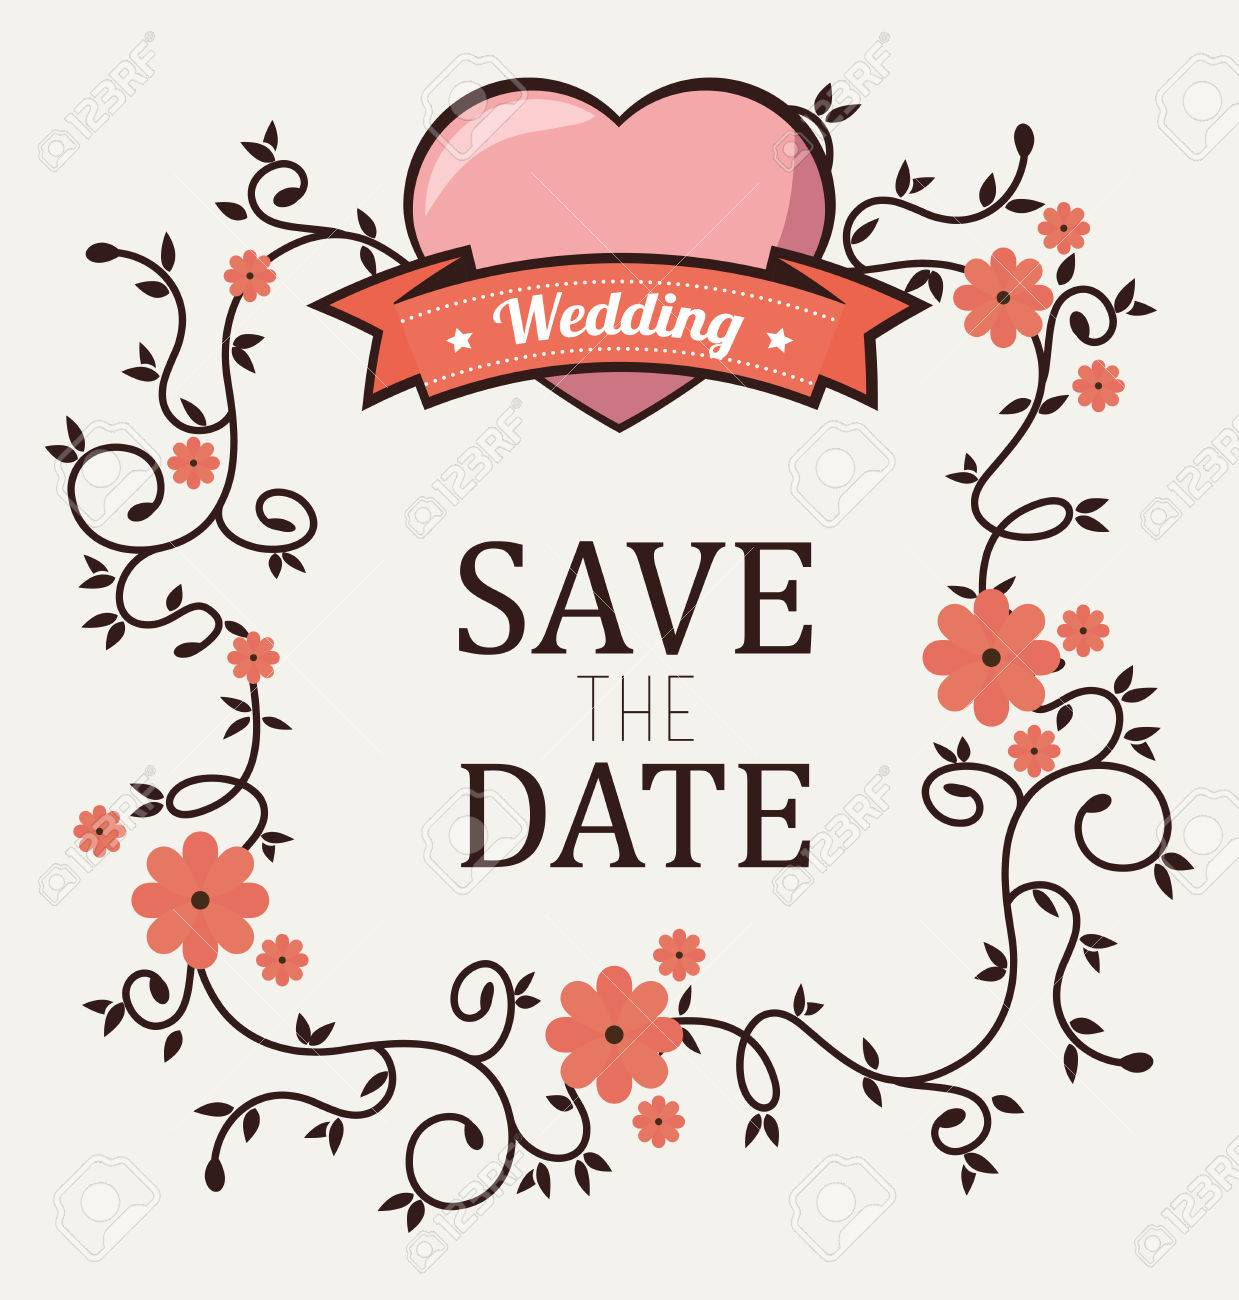 Wedding Invitation Design, Vector Illustration Eps10 Graphic Royalty ...